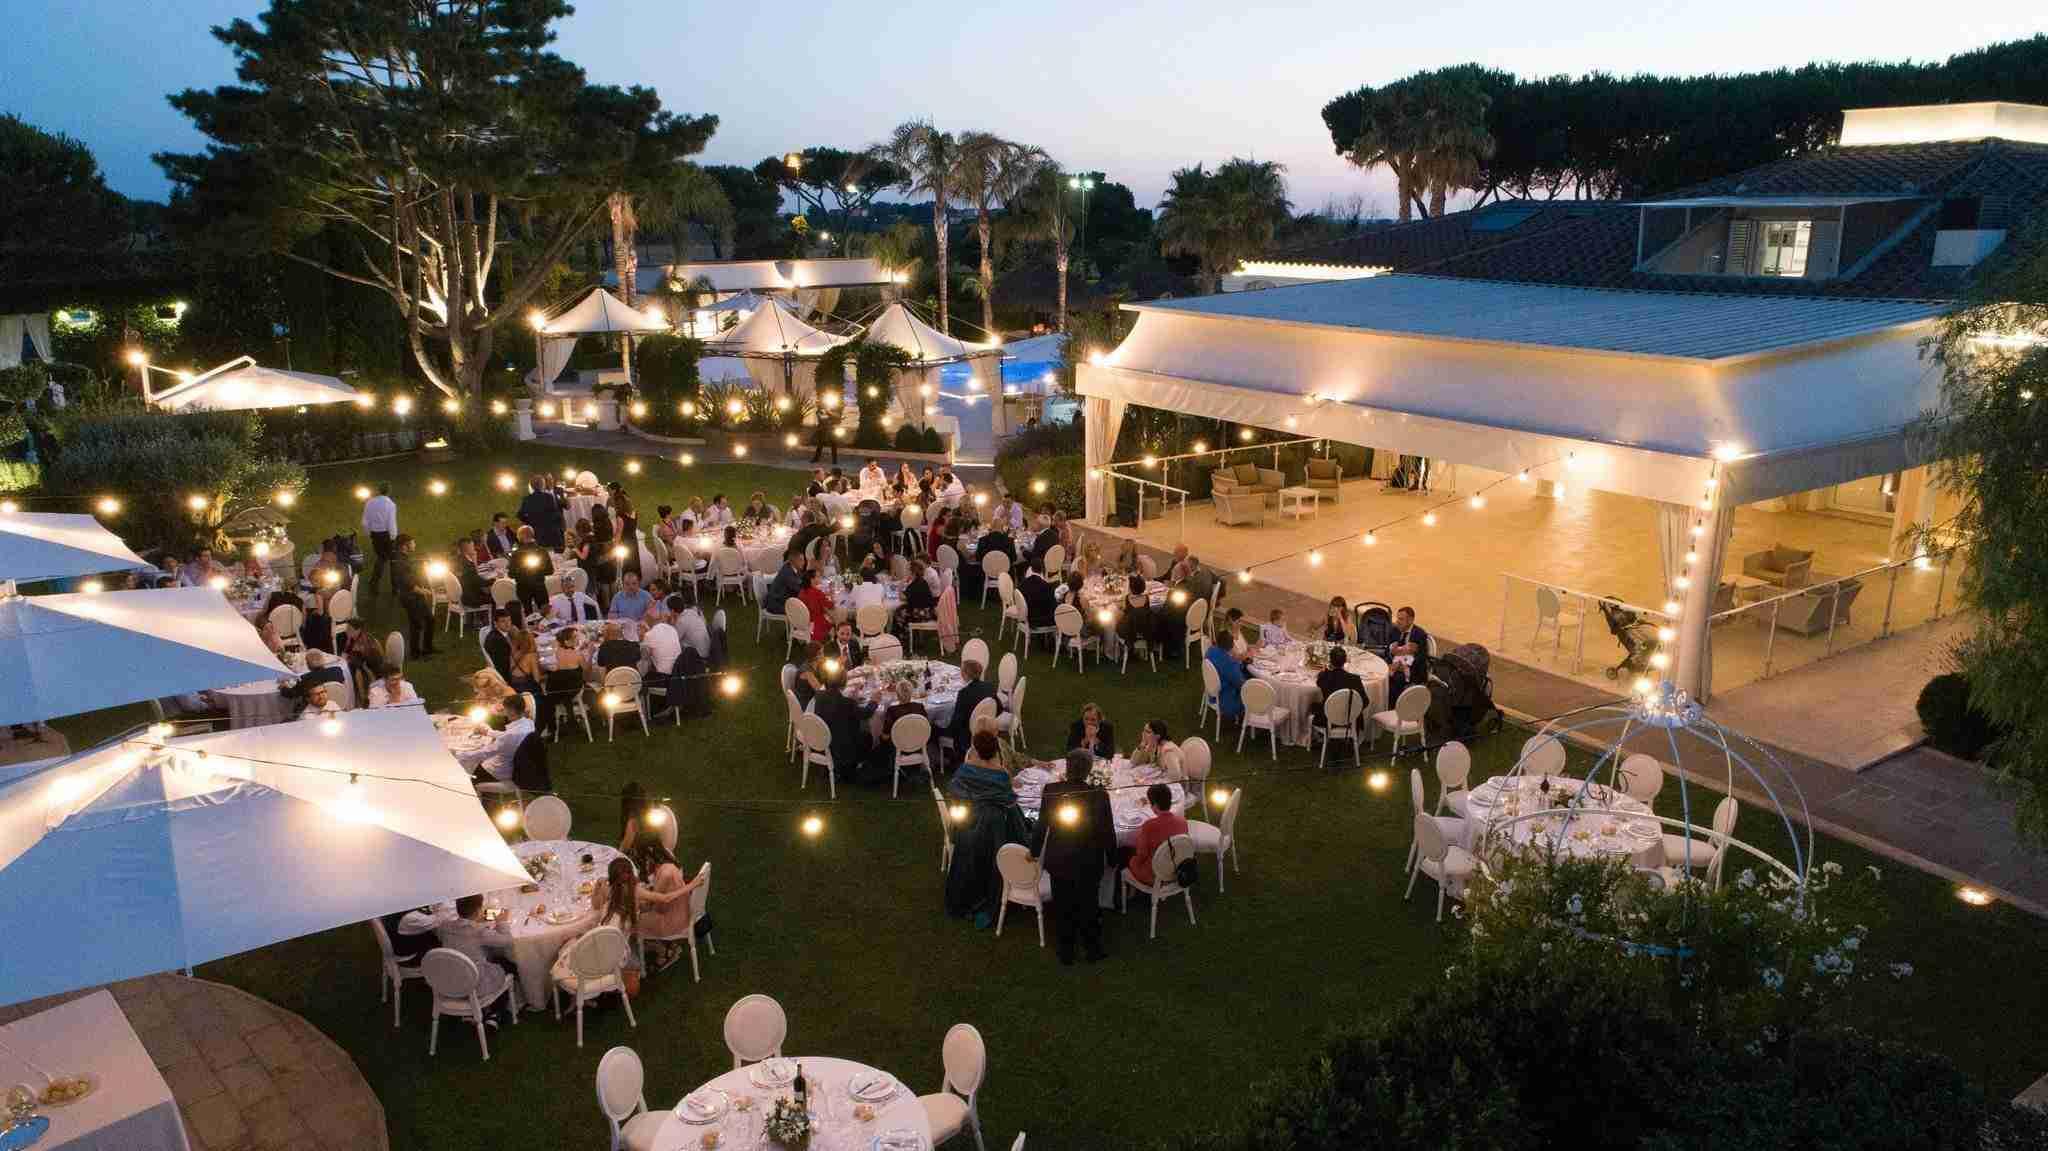 Ricevimento Matrimonio in giardino - Villa Demetra